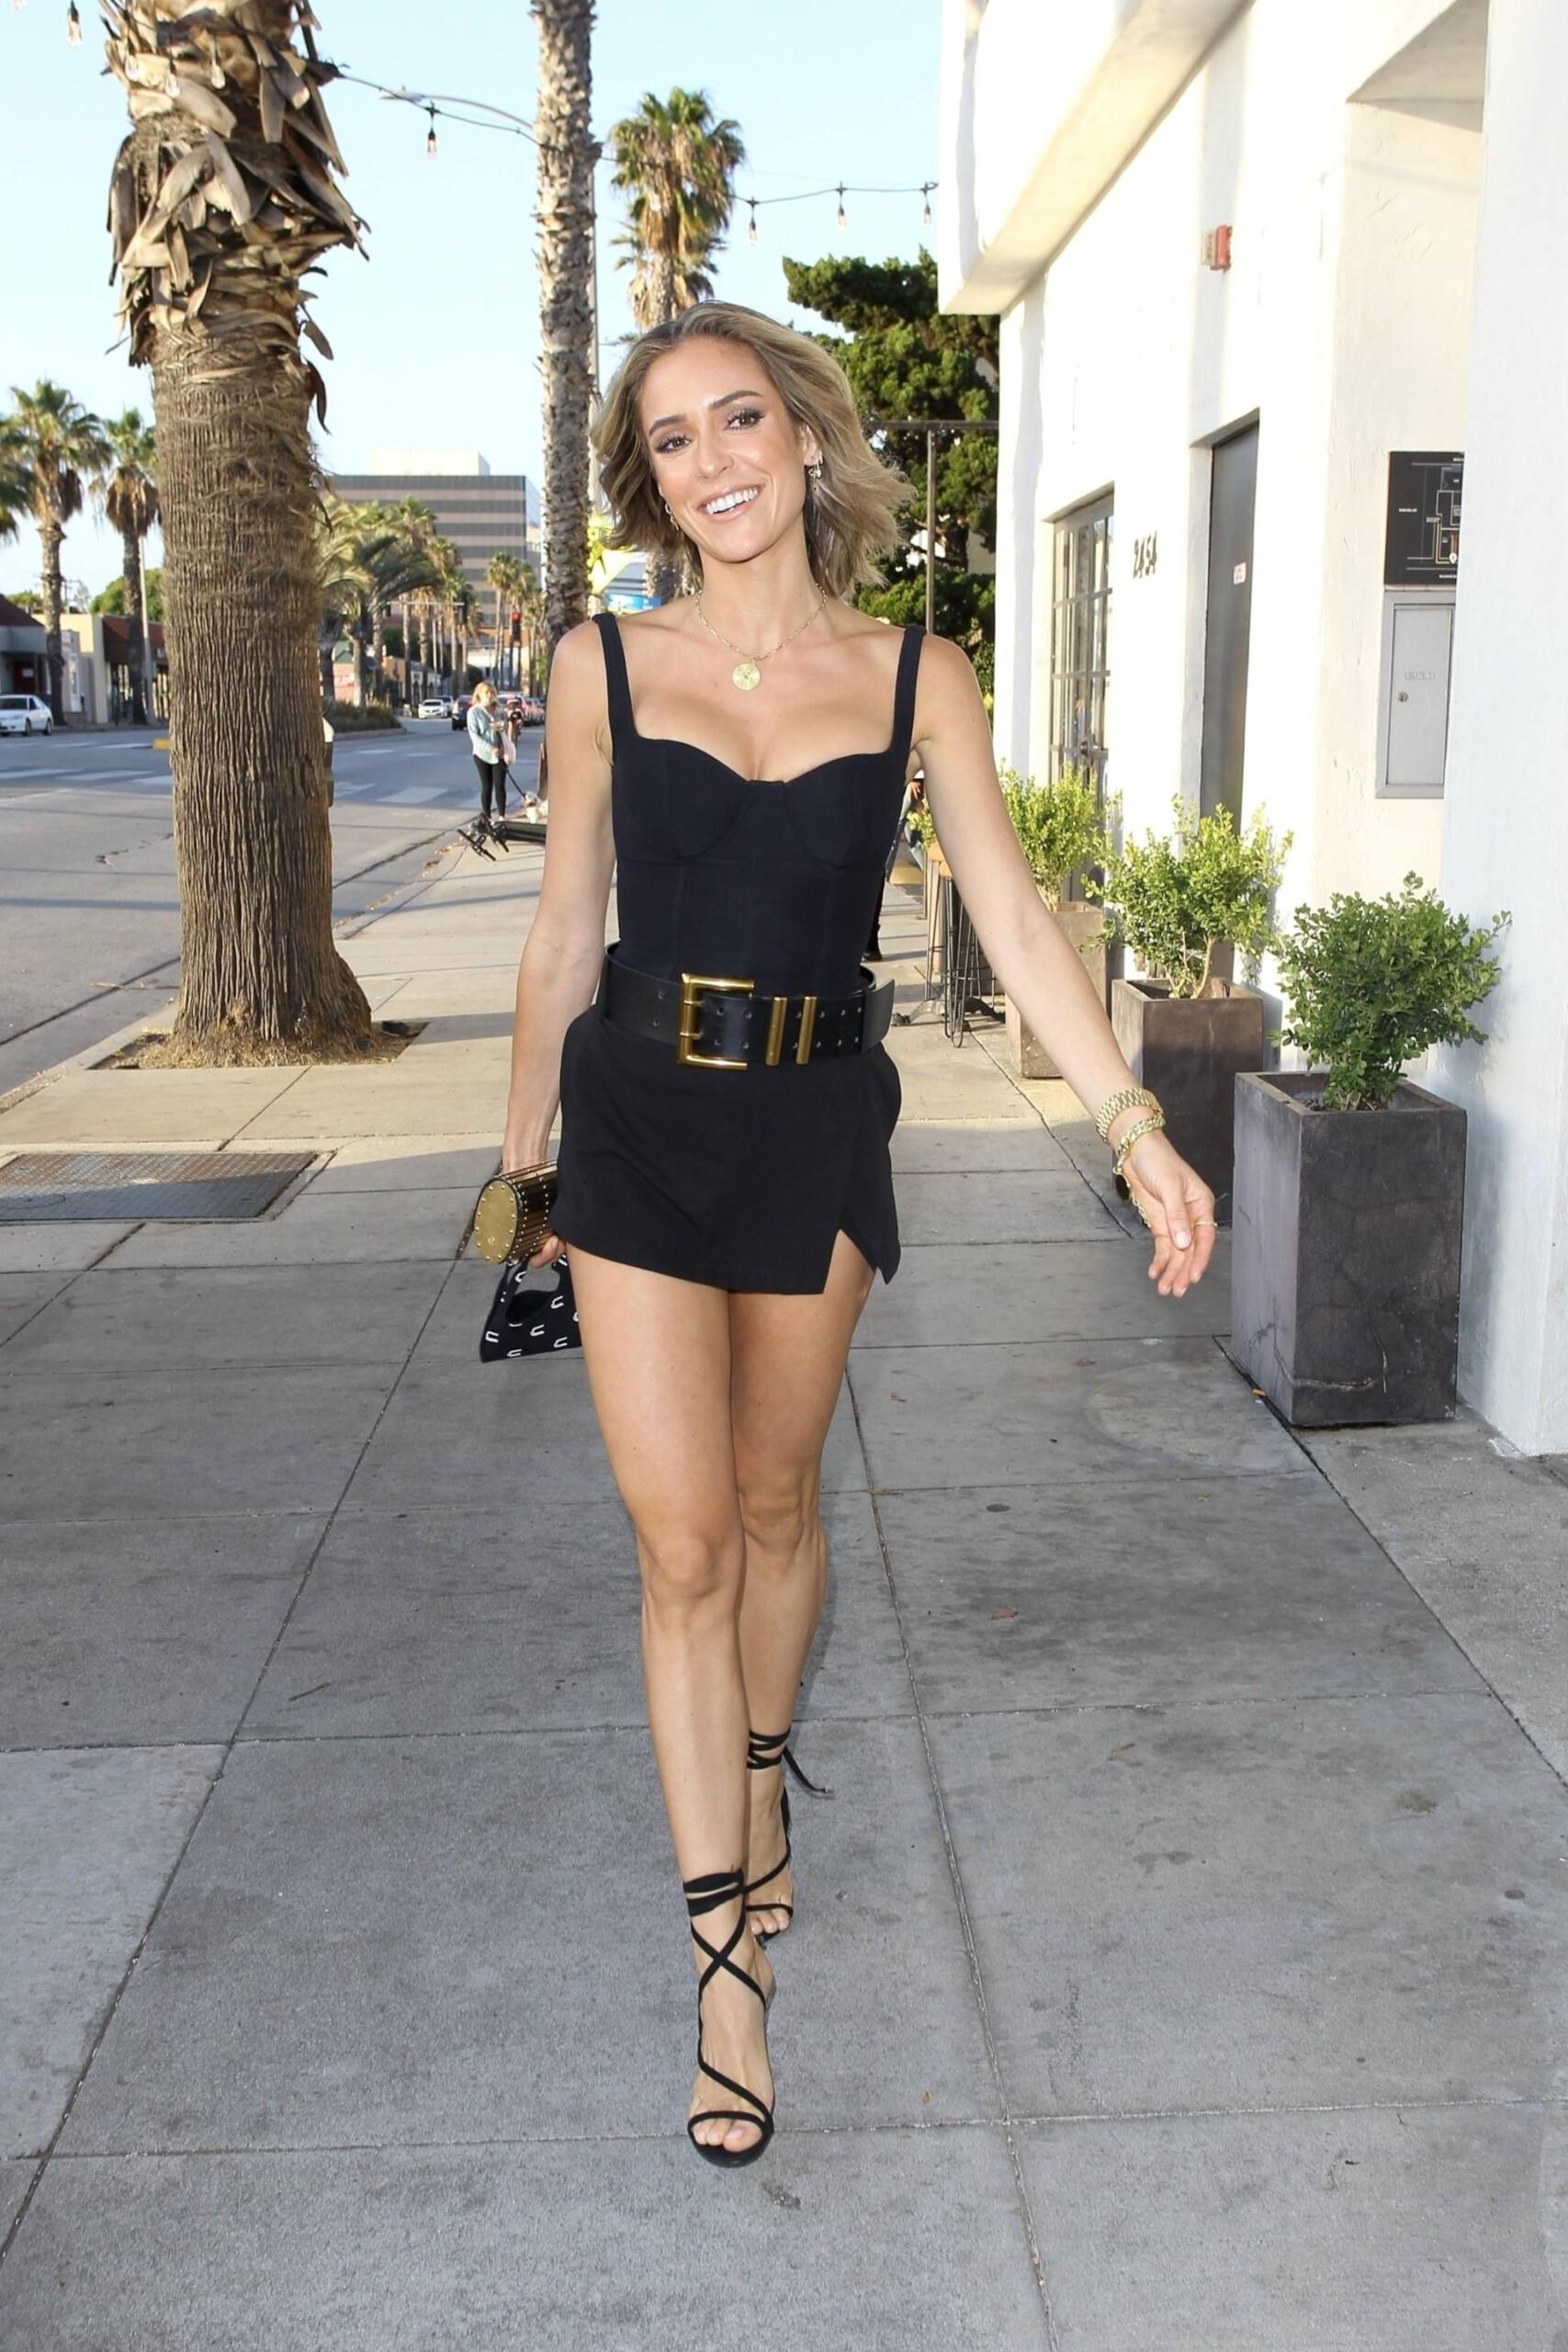 Kristin Cavallari – Sexy Legs And Beautiful Cleavage At Fia In Santa Monica 0008